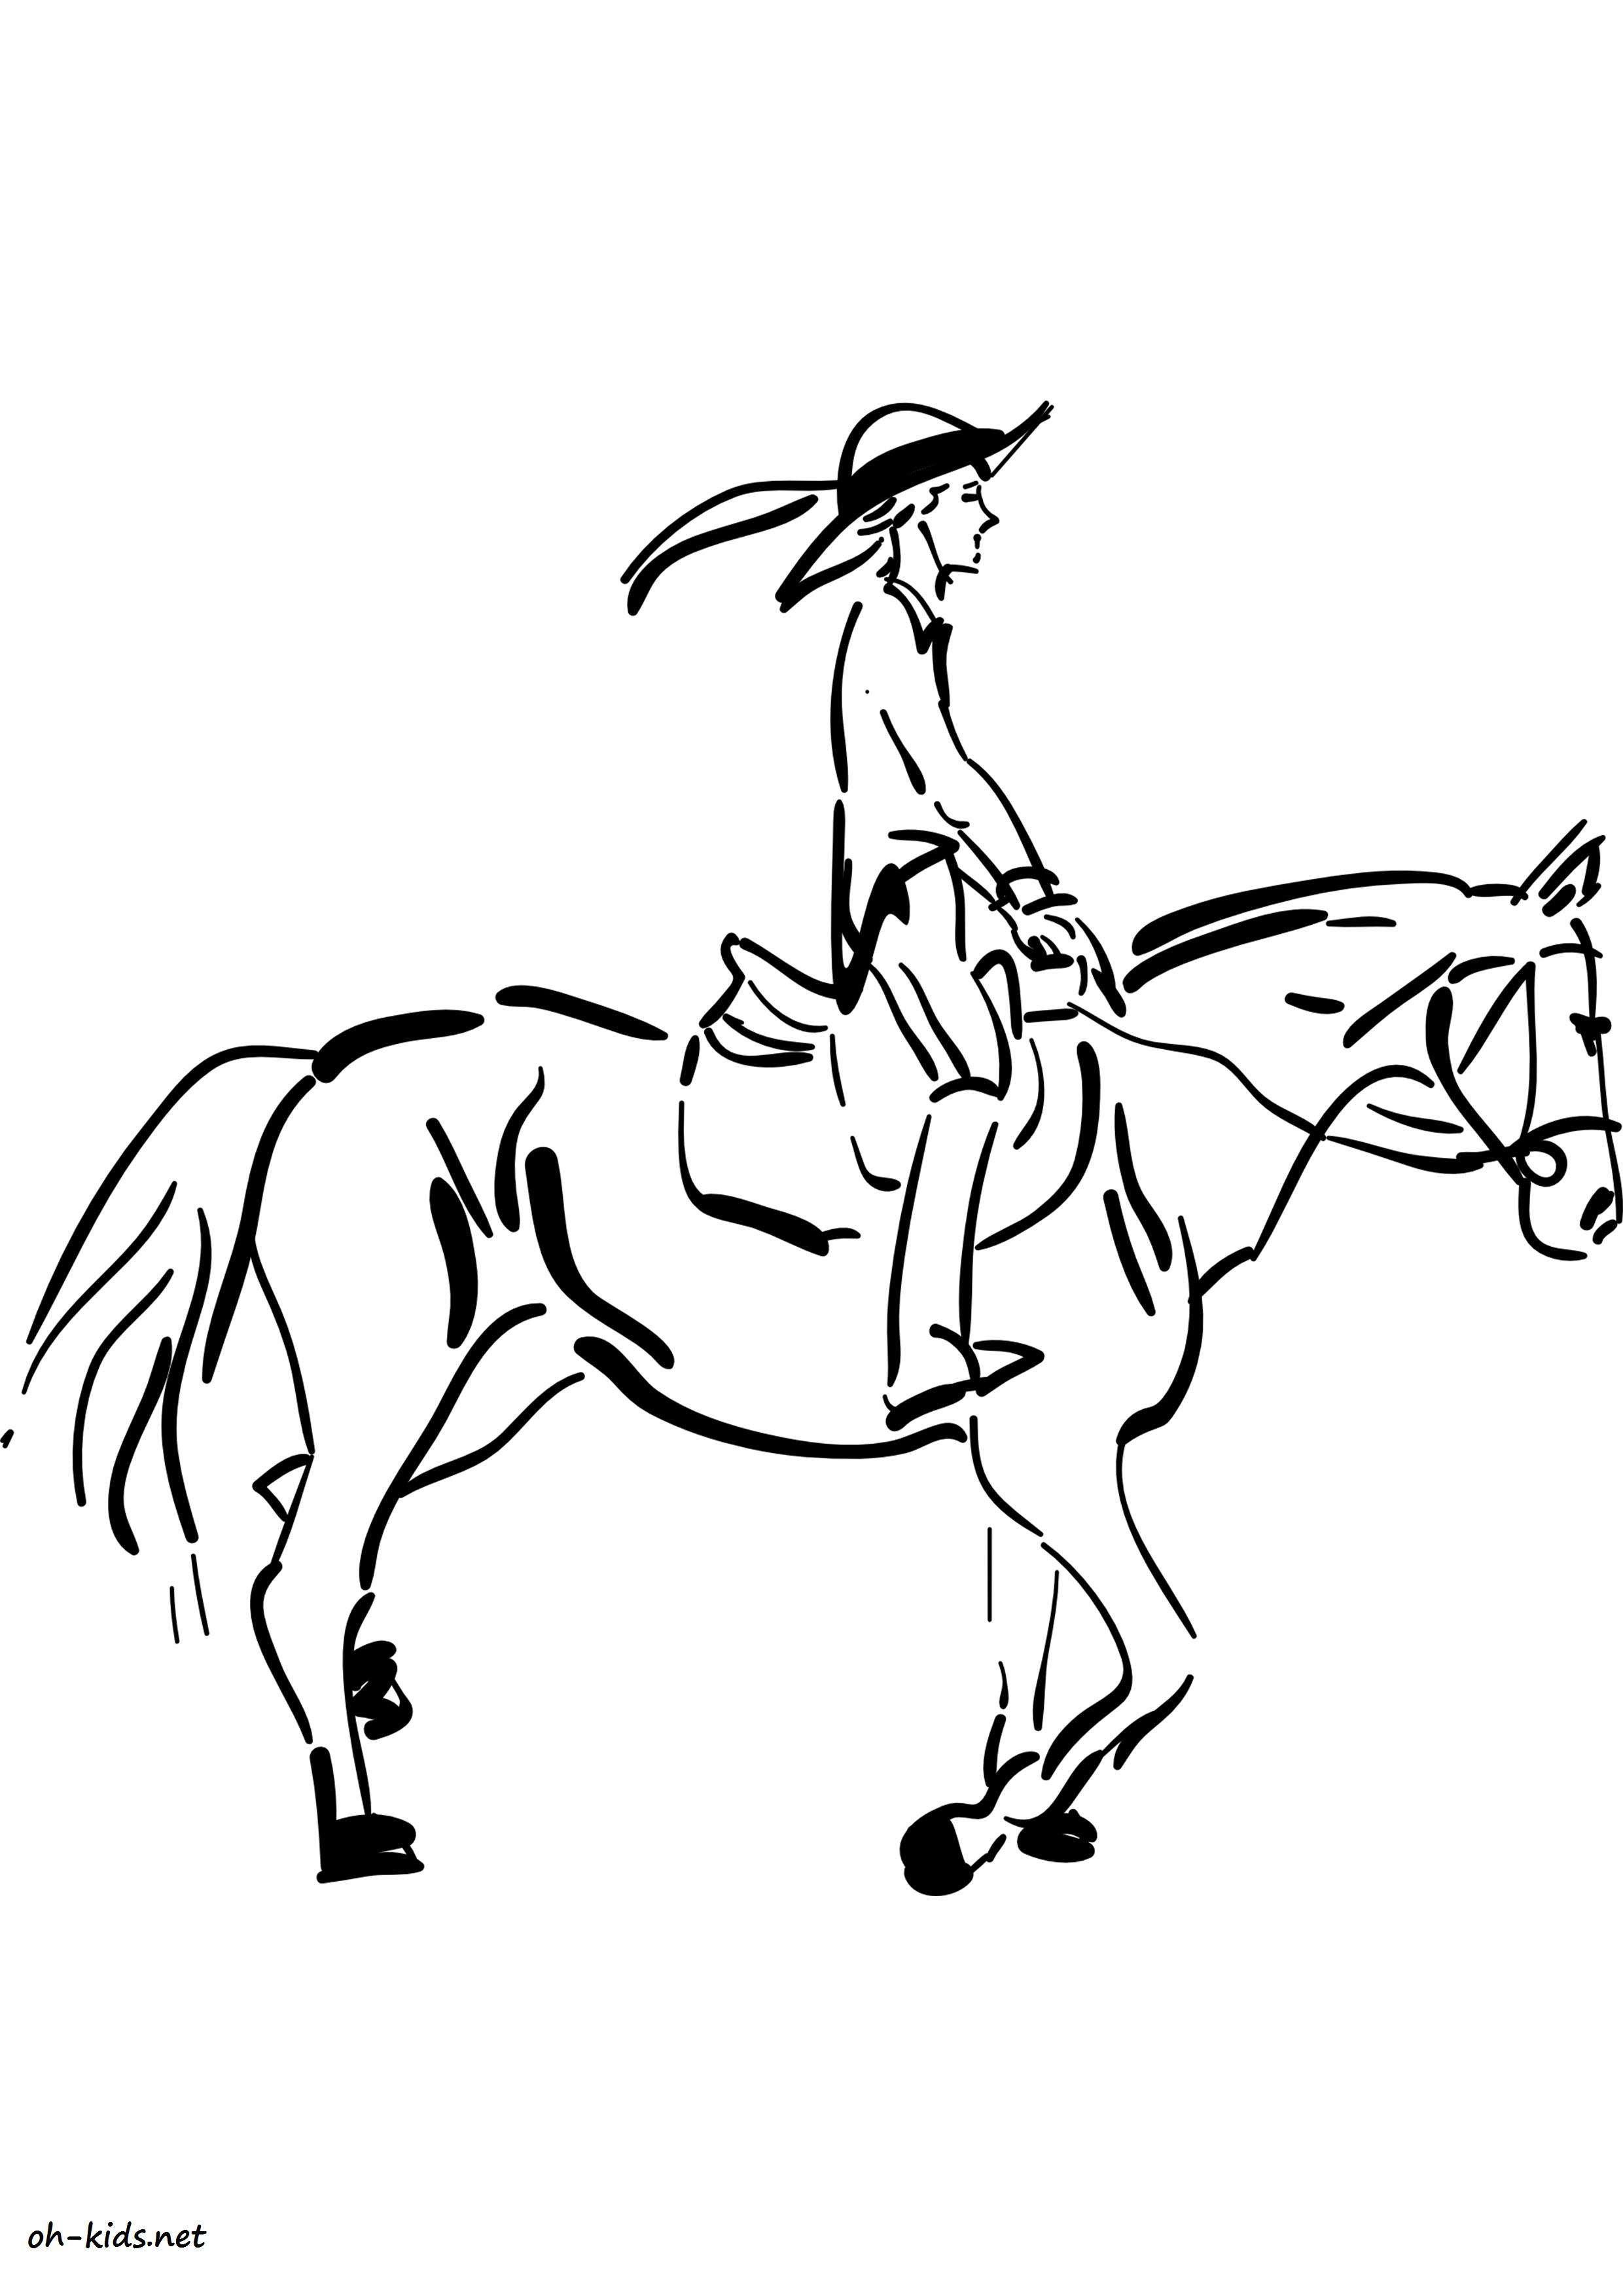 Dessin de équitation a imprimer Dessin 1368